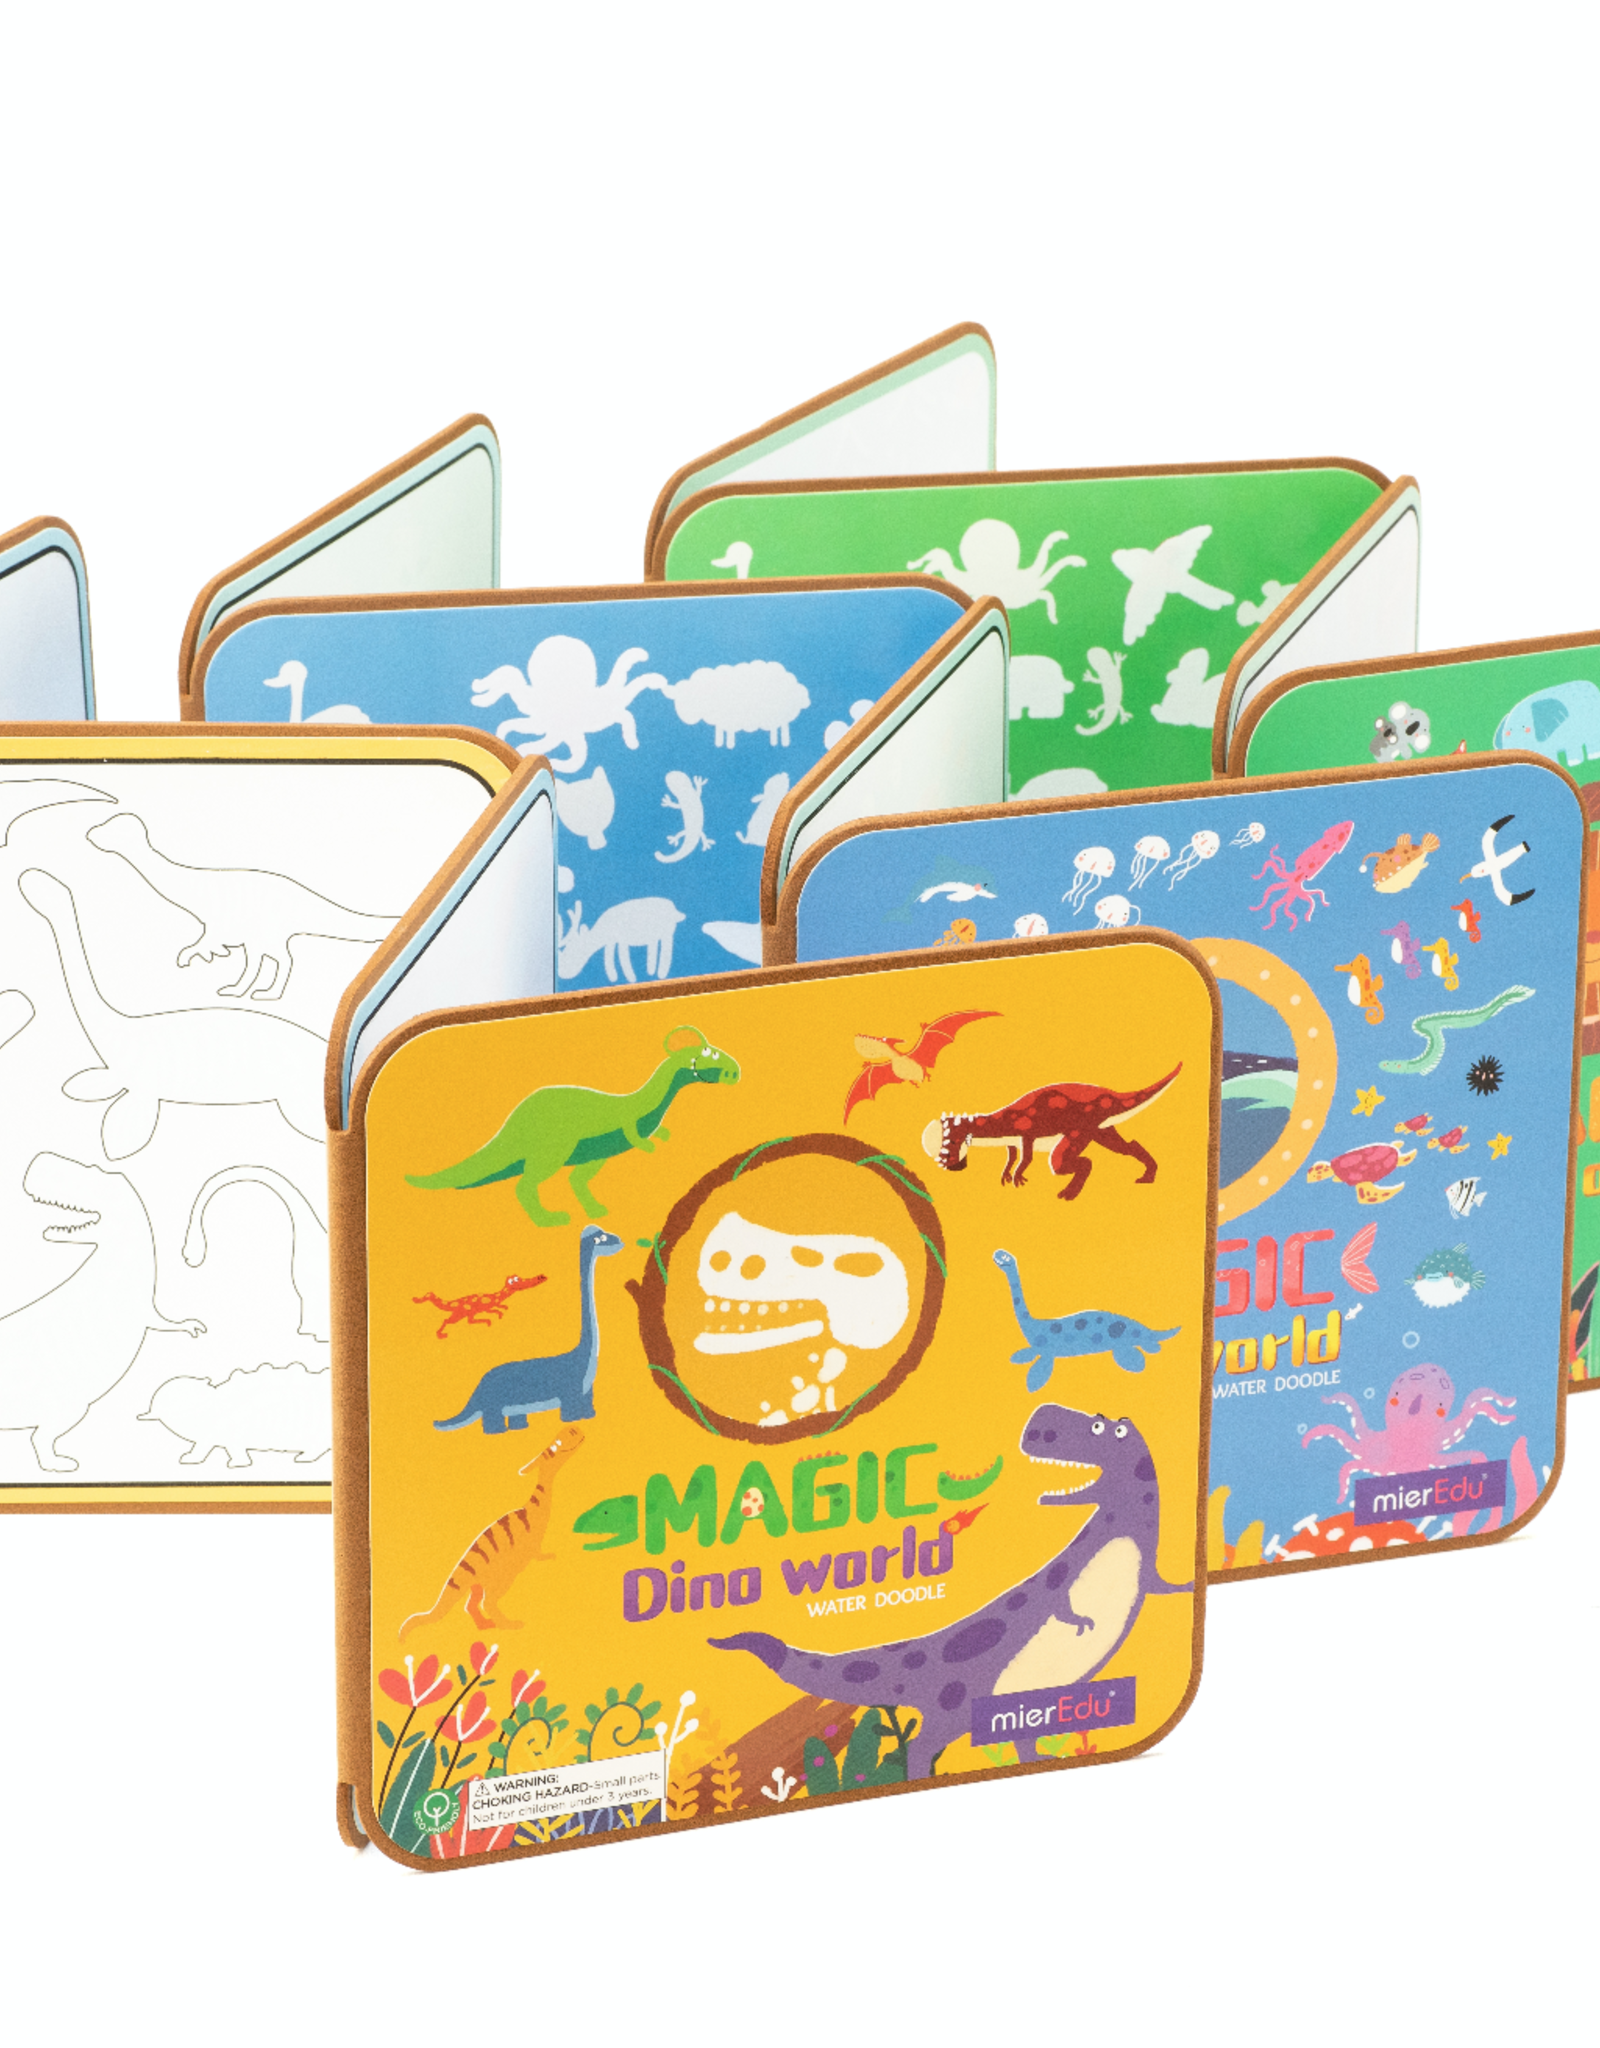 MierEDU Magic Water Doodle Book - Dino World